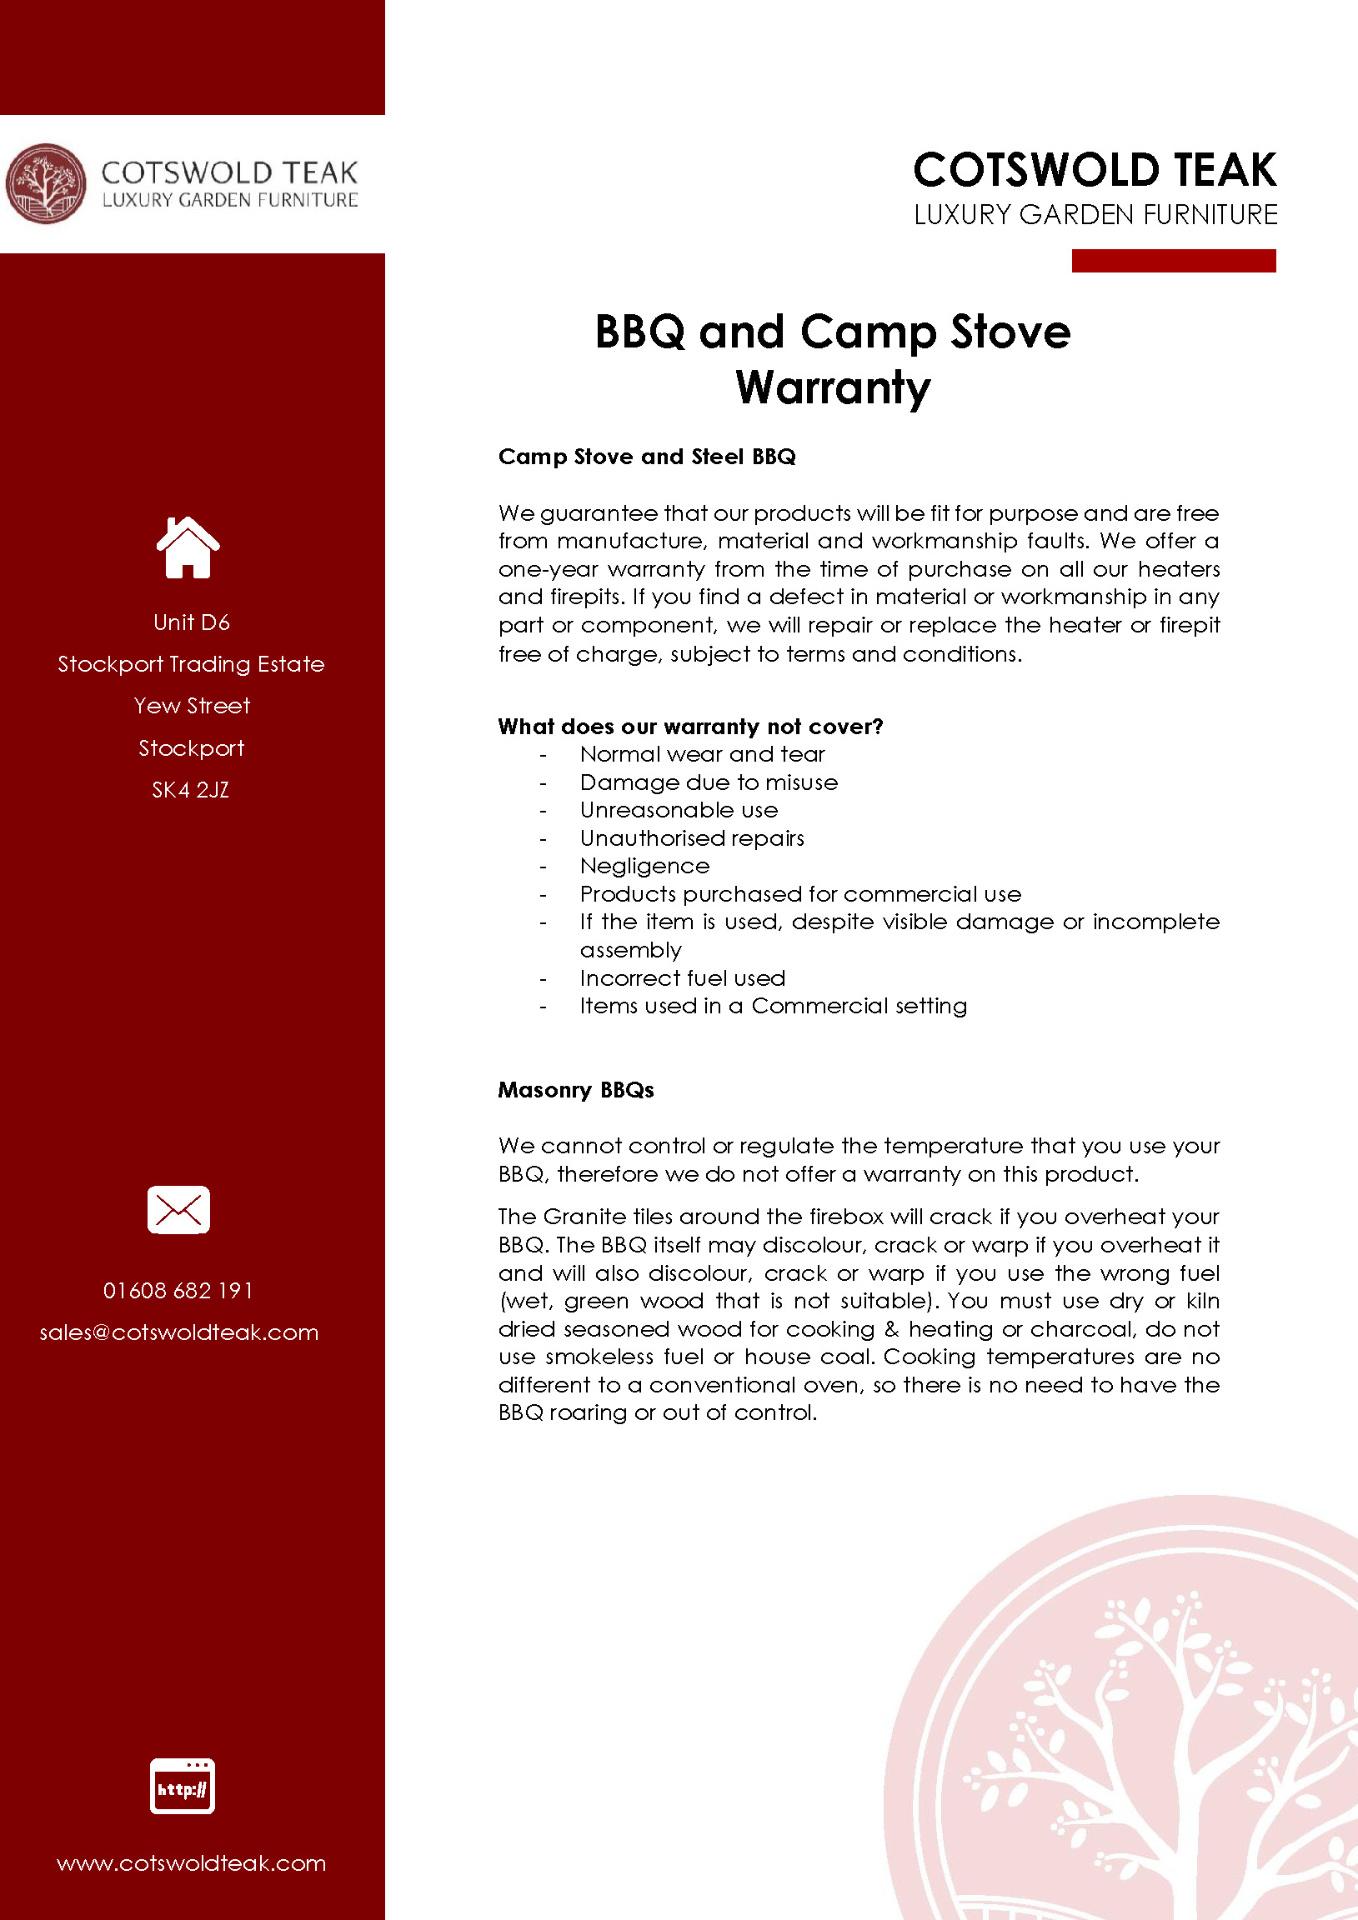 cotswold-teak-bbq-camp-stove-warranty.jpg